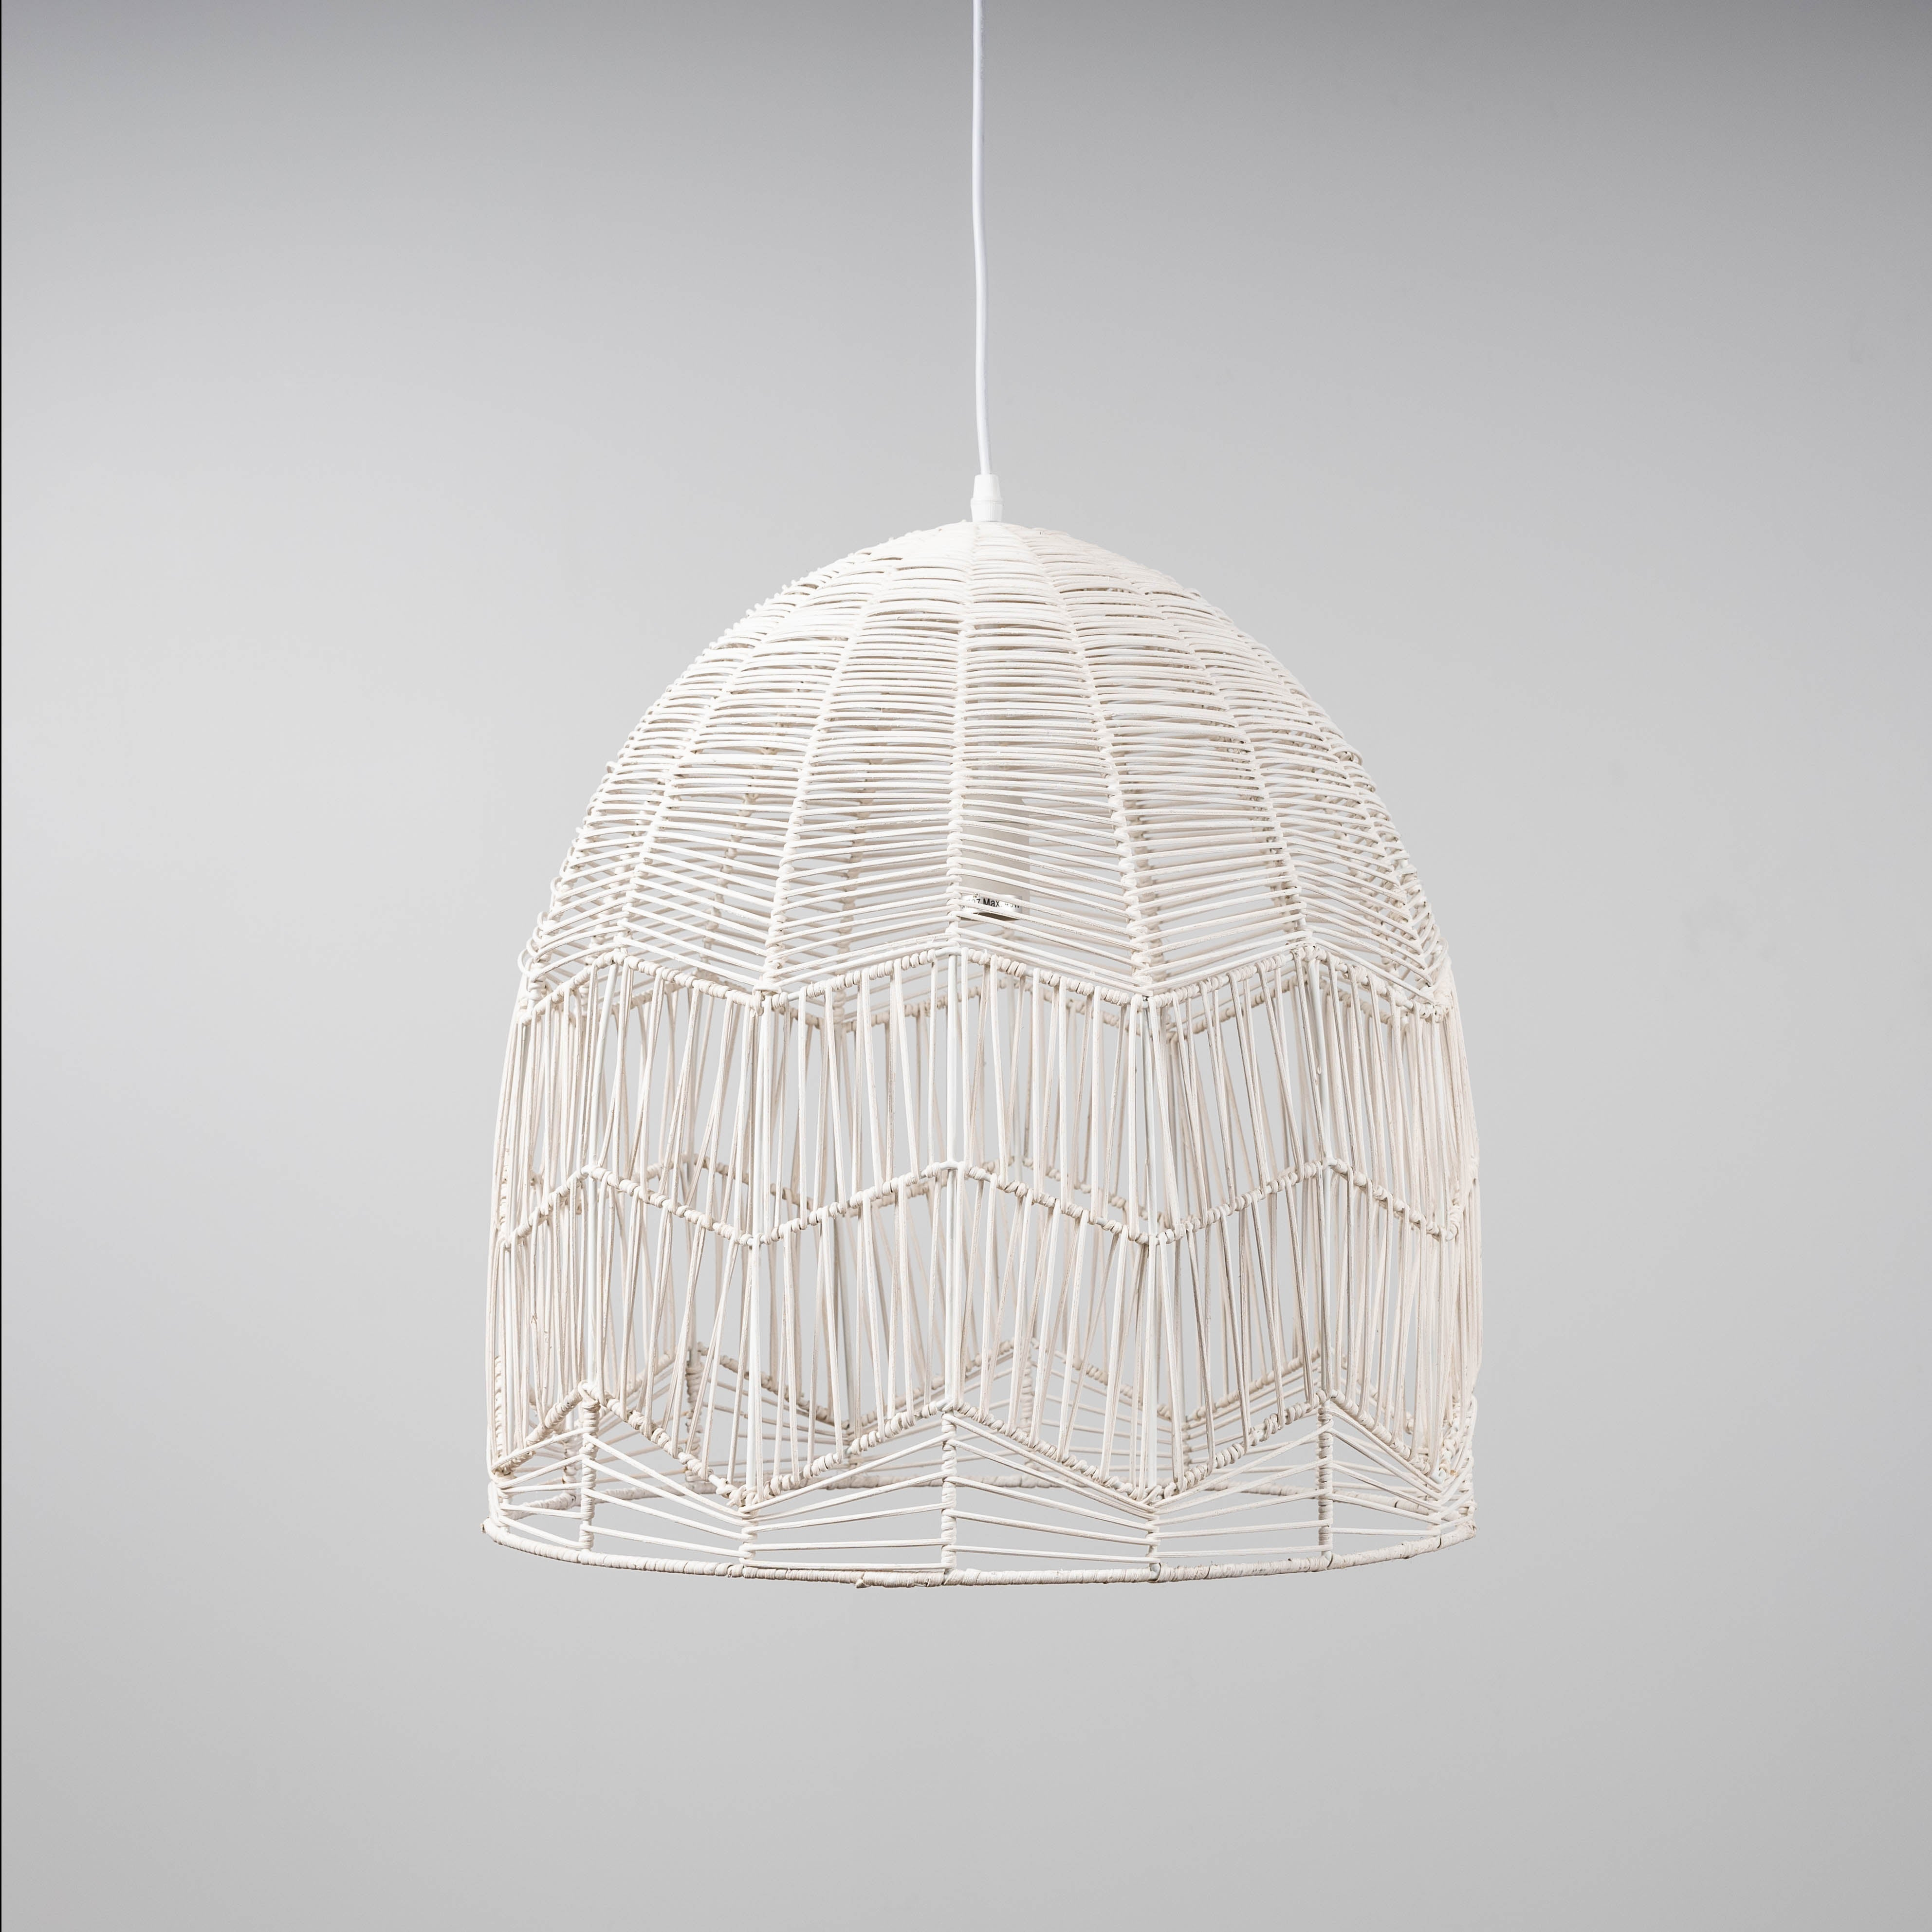 Whitewash Rattan Lace Pendant Light - Amalfi - 2 Sizes